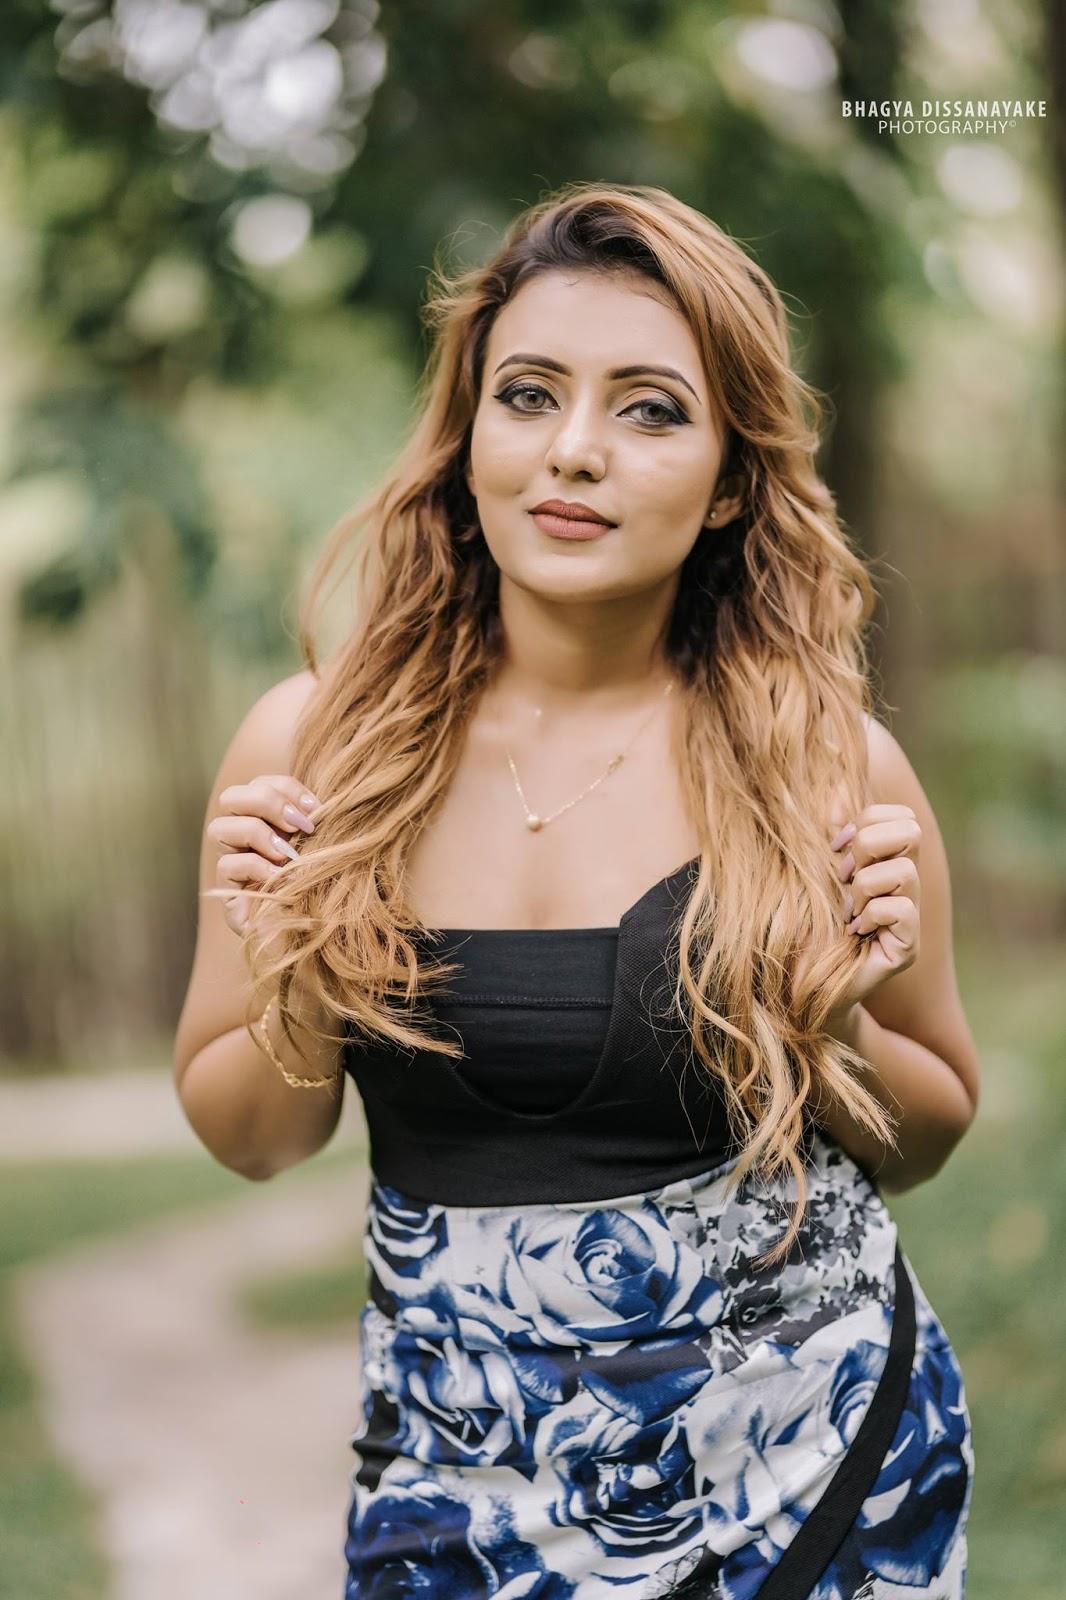 Upcoming model Fashion Shani Shenaya Wickremasinghe - Sri